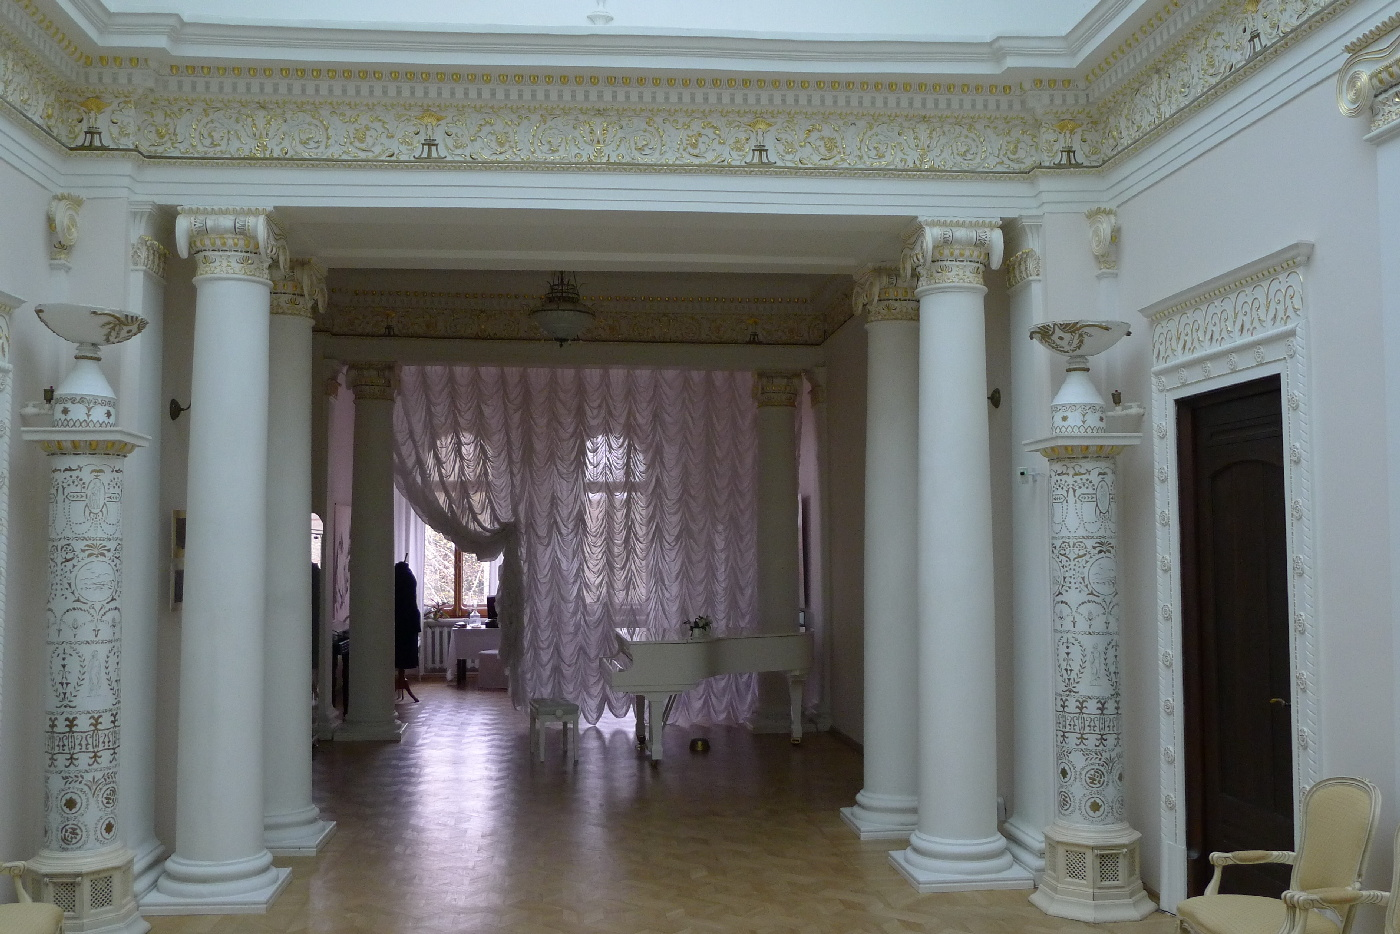 Русский Юг: Тамбов (Усадьба Асеевых, город) P1100361